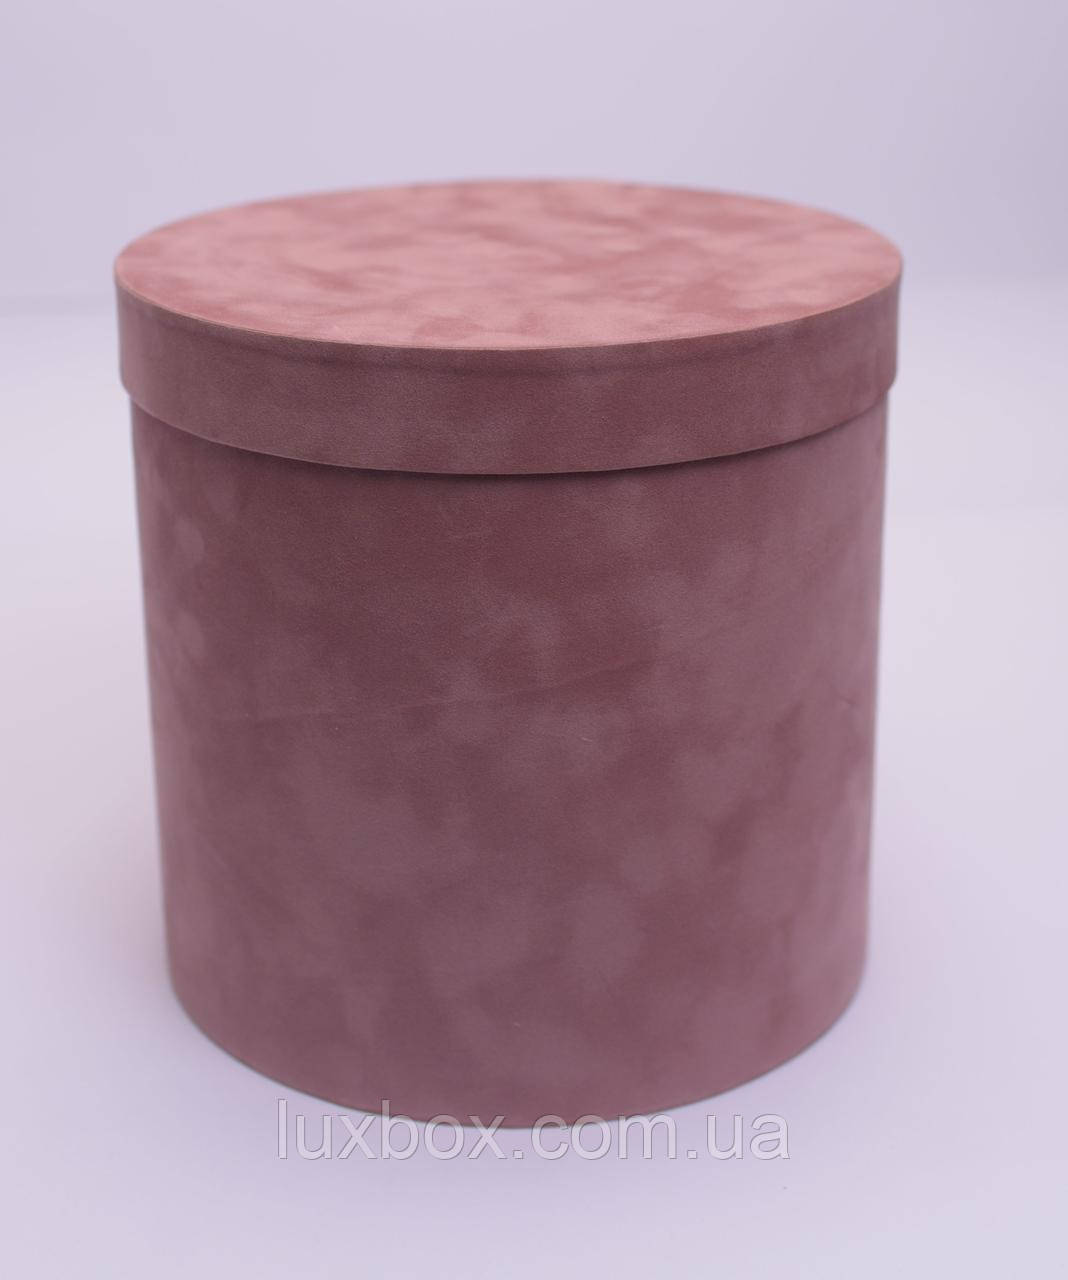 Шляпна коробка Велюрова(бархатна коробка) h16/d16